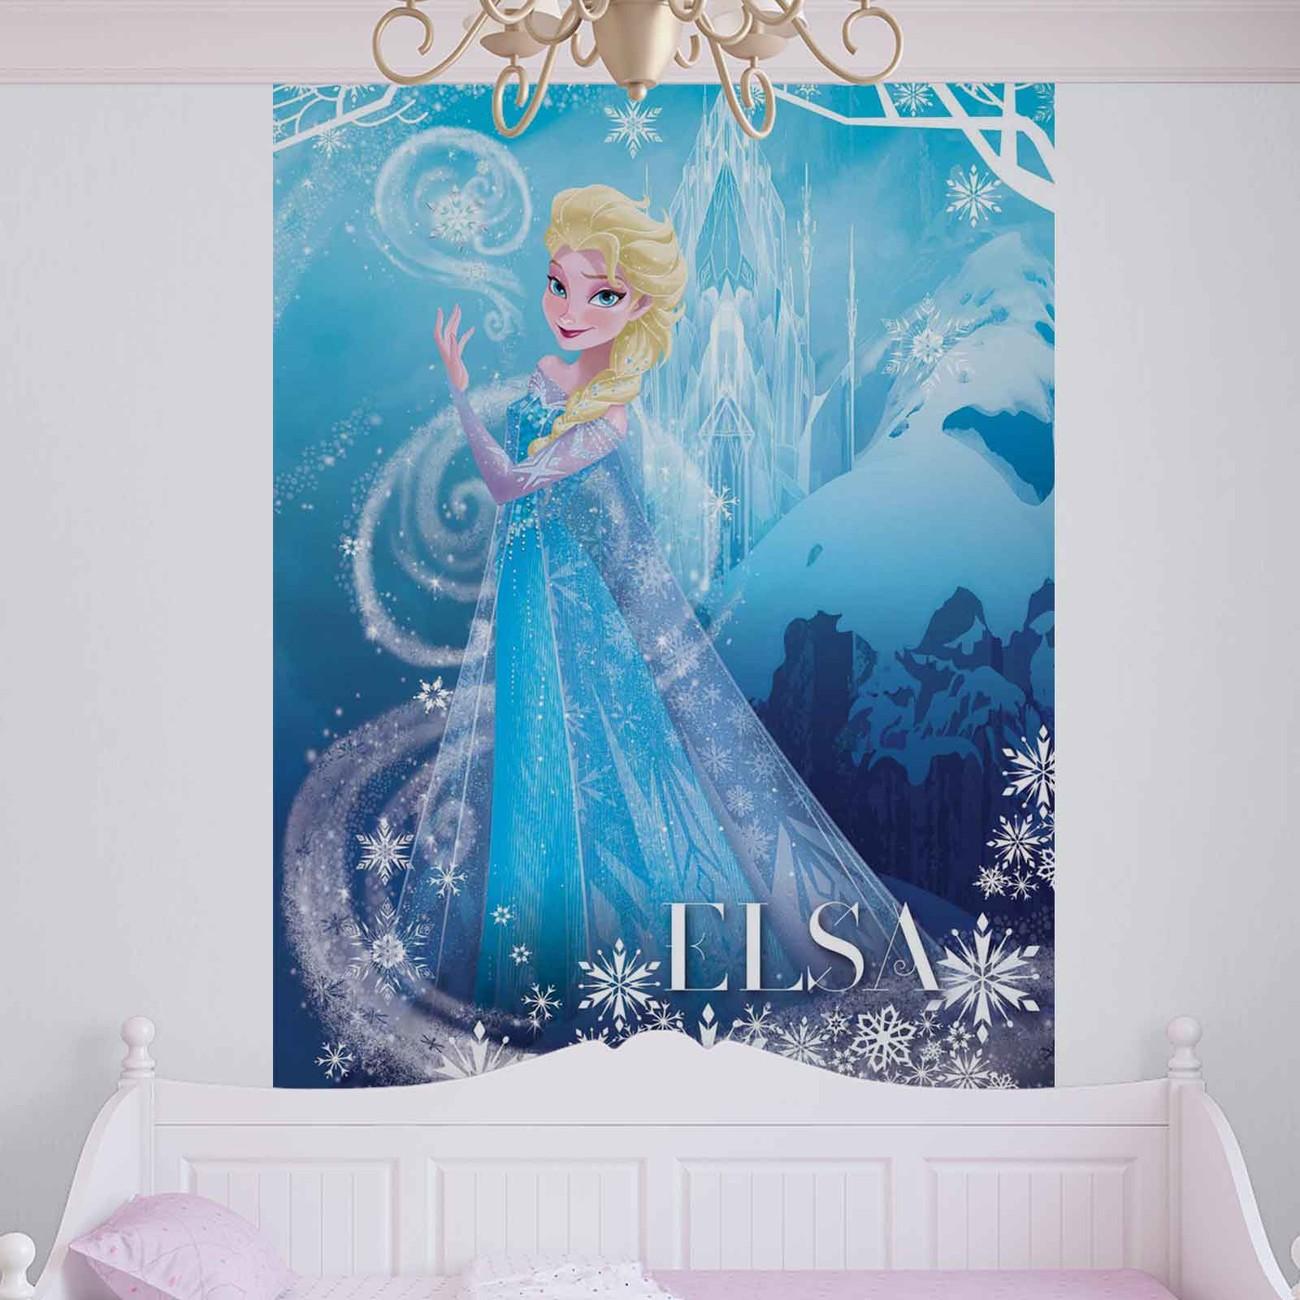 disney la reine des neiges poster mural papier peint. Black Bedroom Furniture Sets. Home Design Ideas